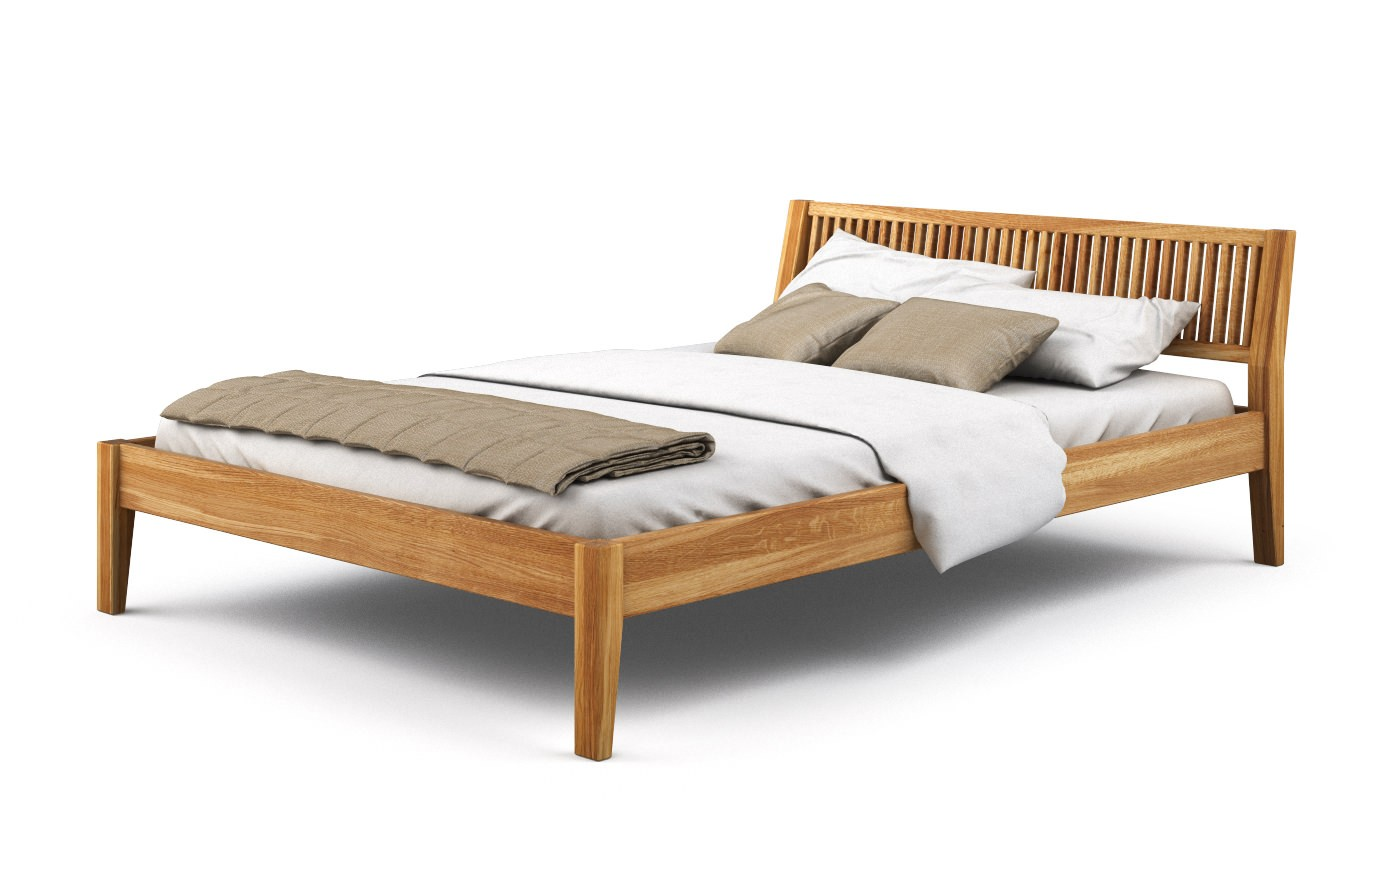 Full Size of Rustikale Holzbetten Rustikales Bett Bauen Kaufen Betten Gunstig Rustikal Massivholzbetten Selber Bettkasten Altes Japanische 90x200 Mit Lattenrost Und Bett Rustikales Bett